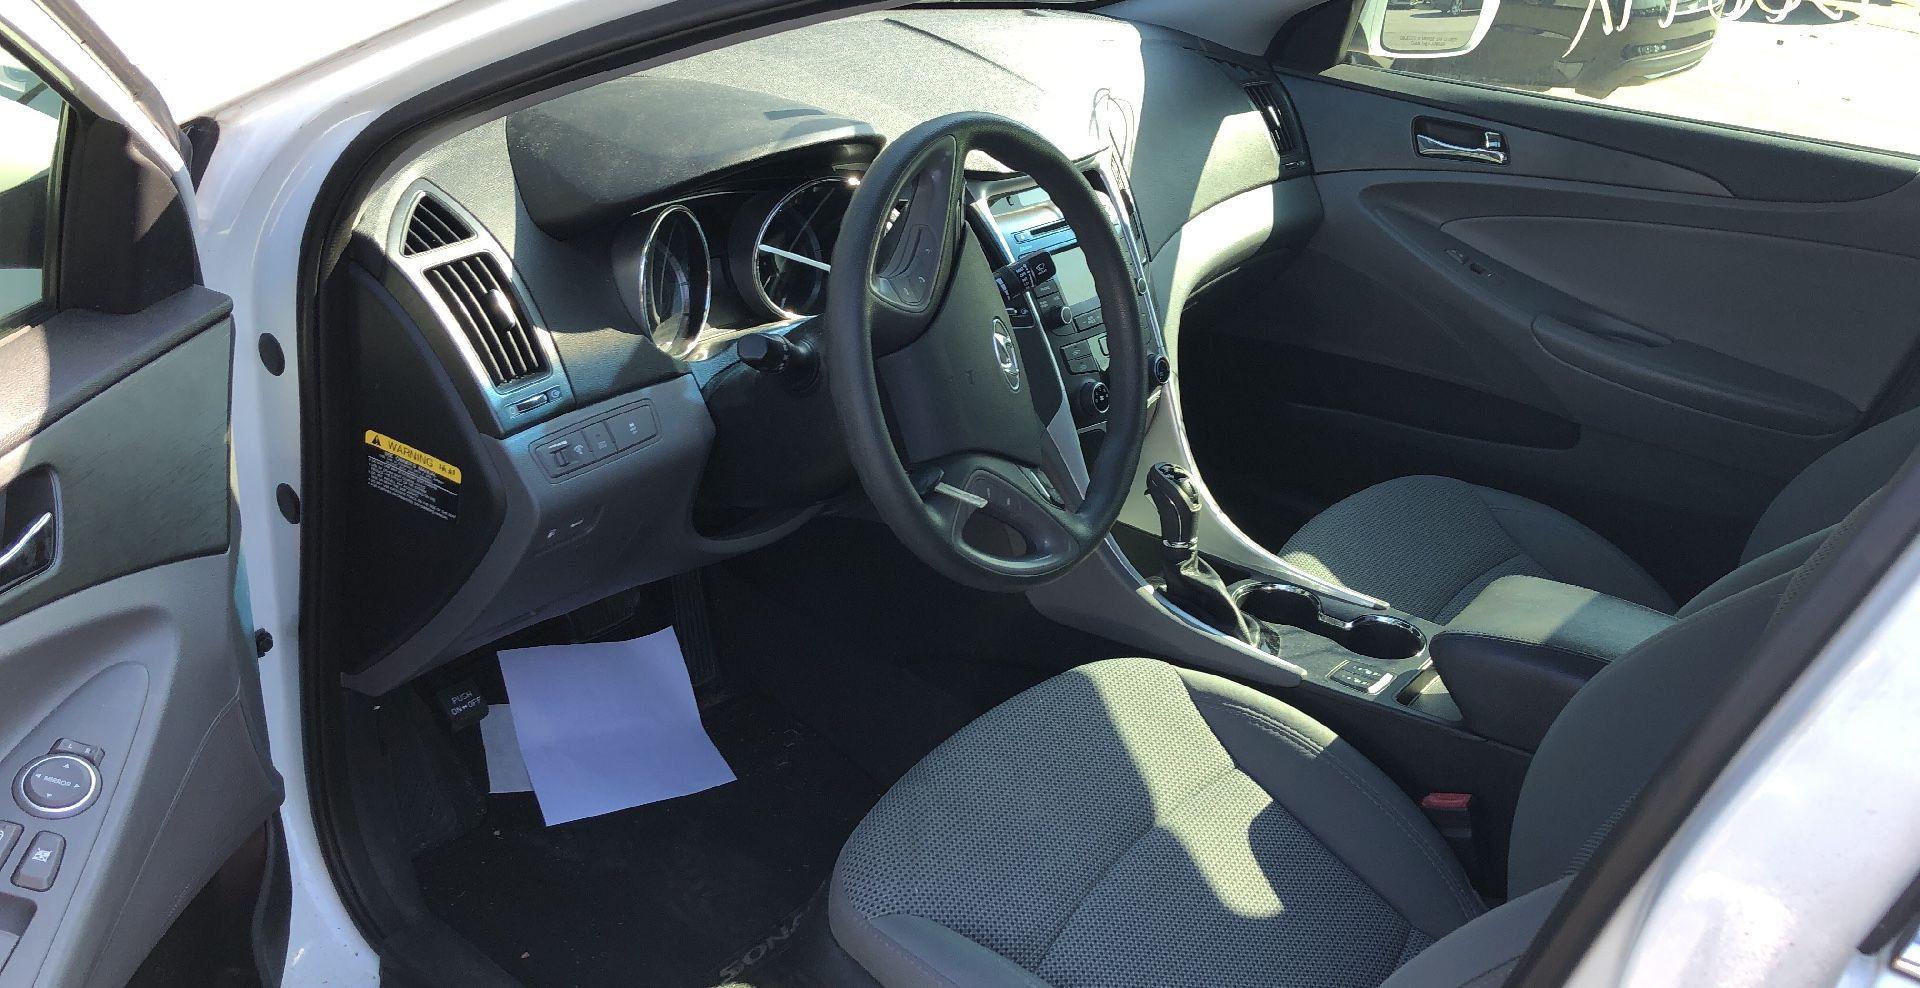 Hyundai Sonata 2.4(lt) 2014 İkinci əl  $6200